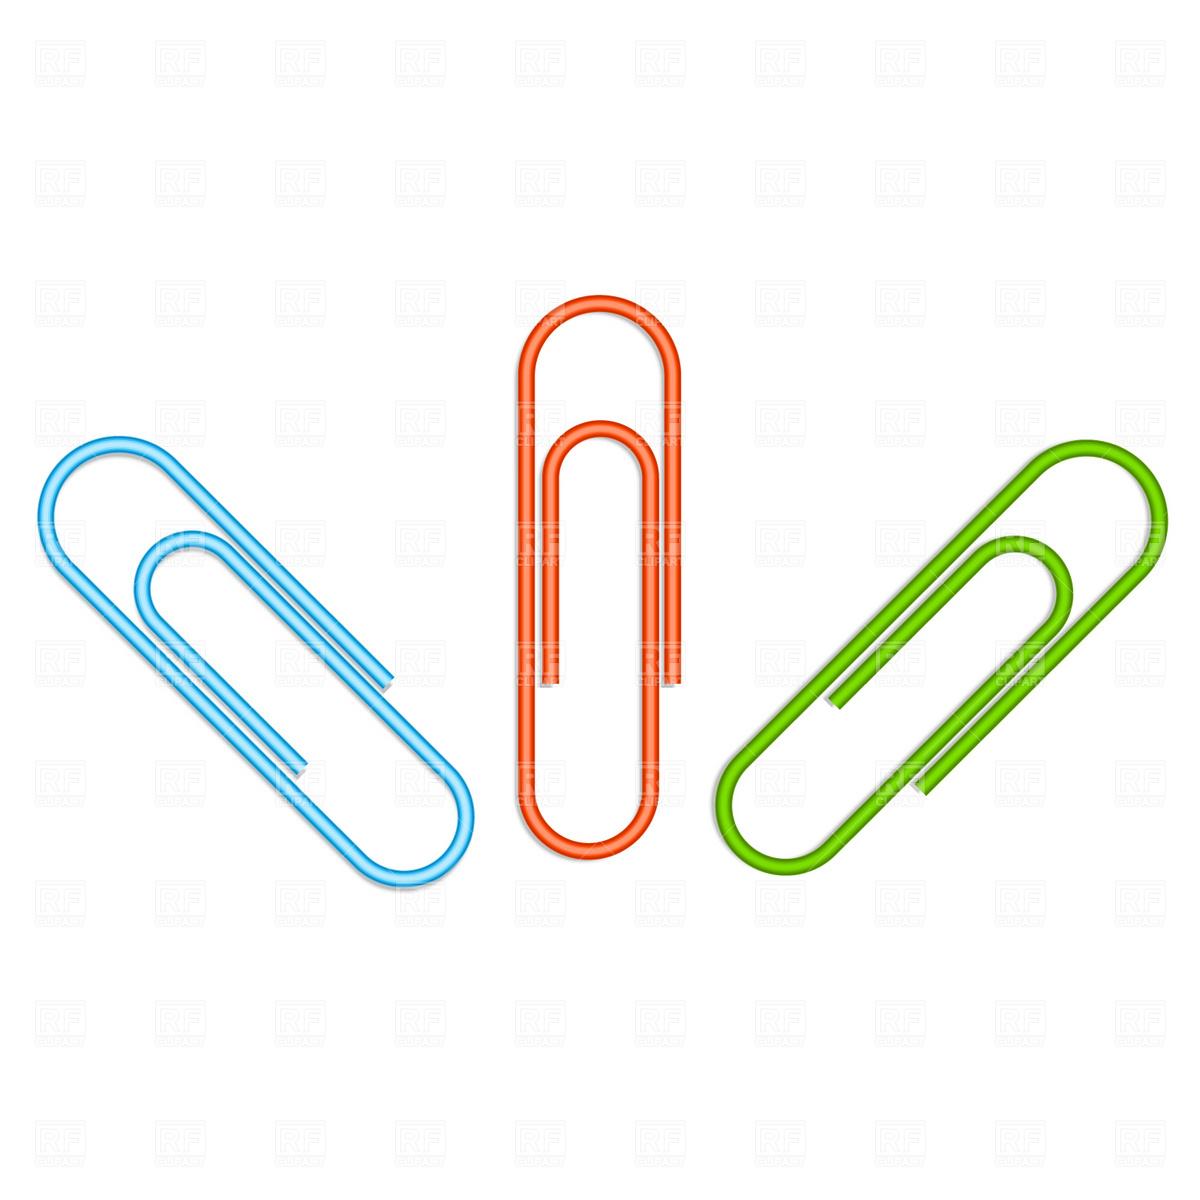 Paper clip / fastener Vector Image #1764.